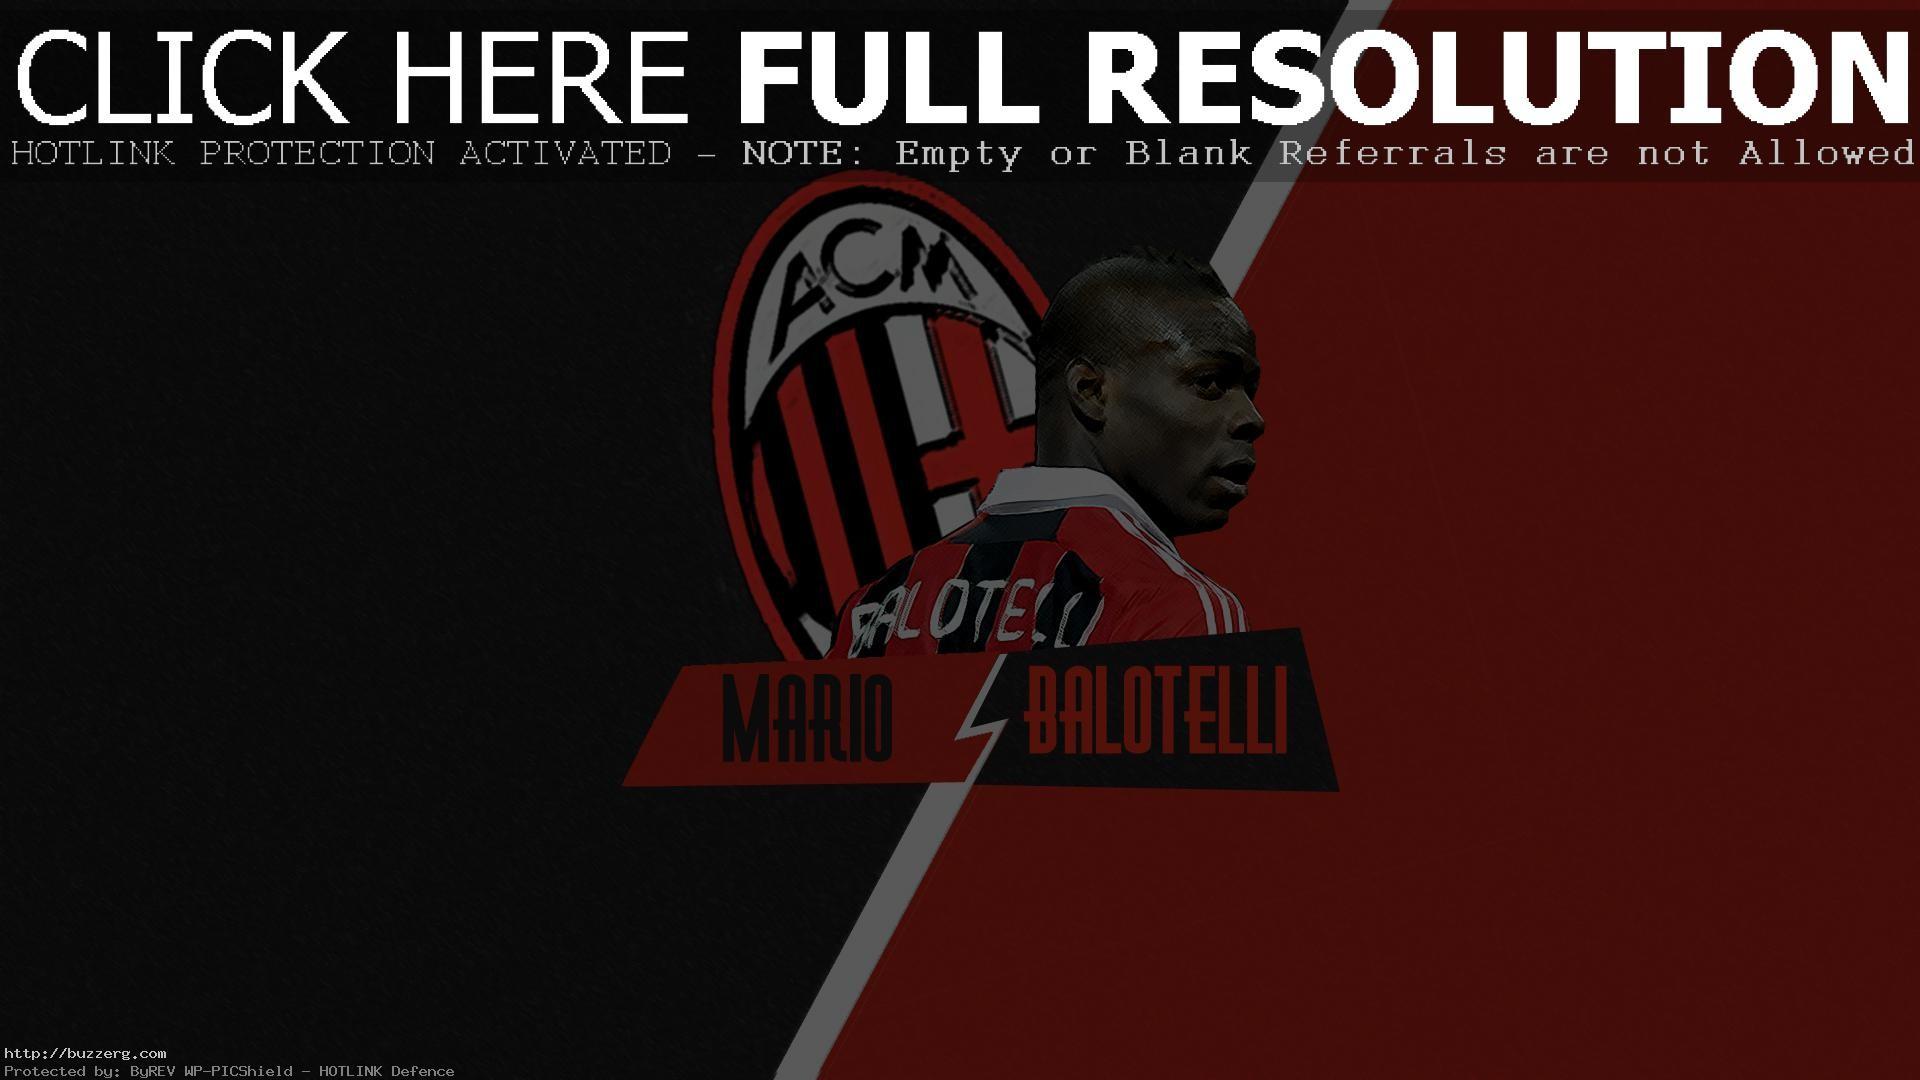 Mario Balotelli Ac Milan (id: 96384)